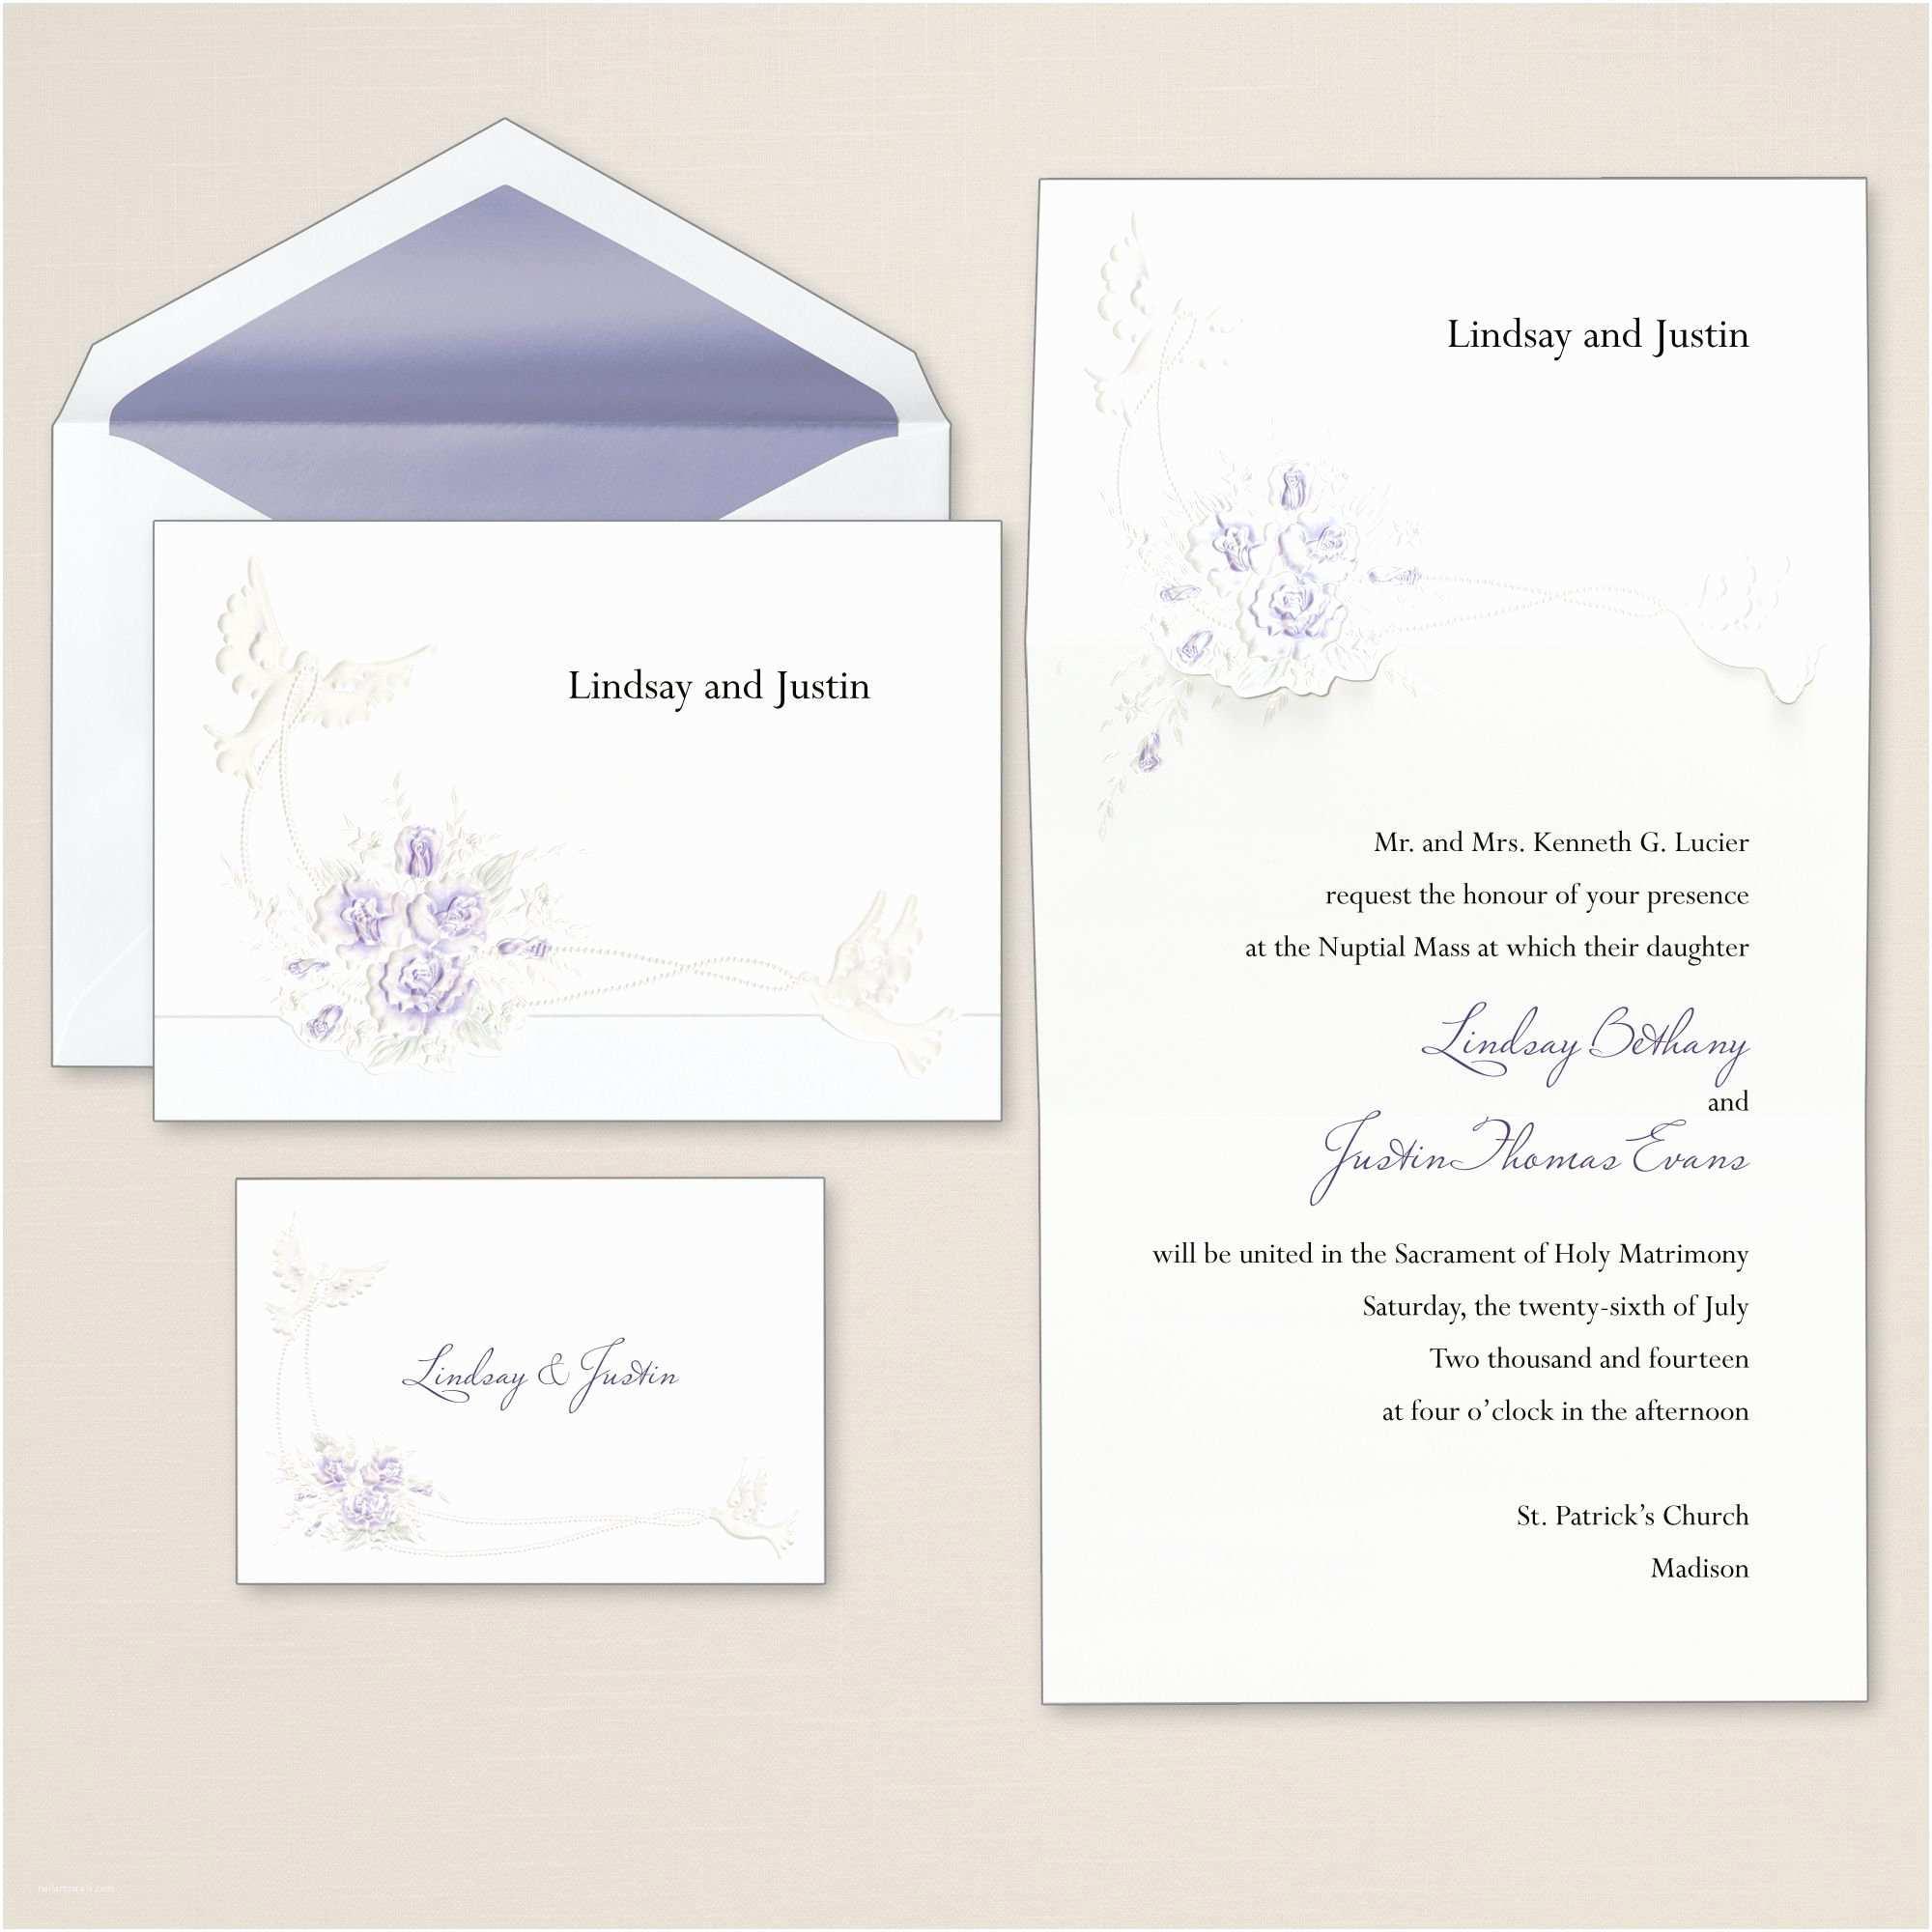 Wedding Invitations with Rsvp Wedding Invitation Wedding Invitations Reply Cards New